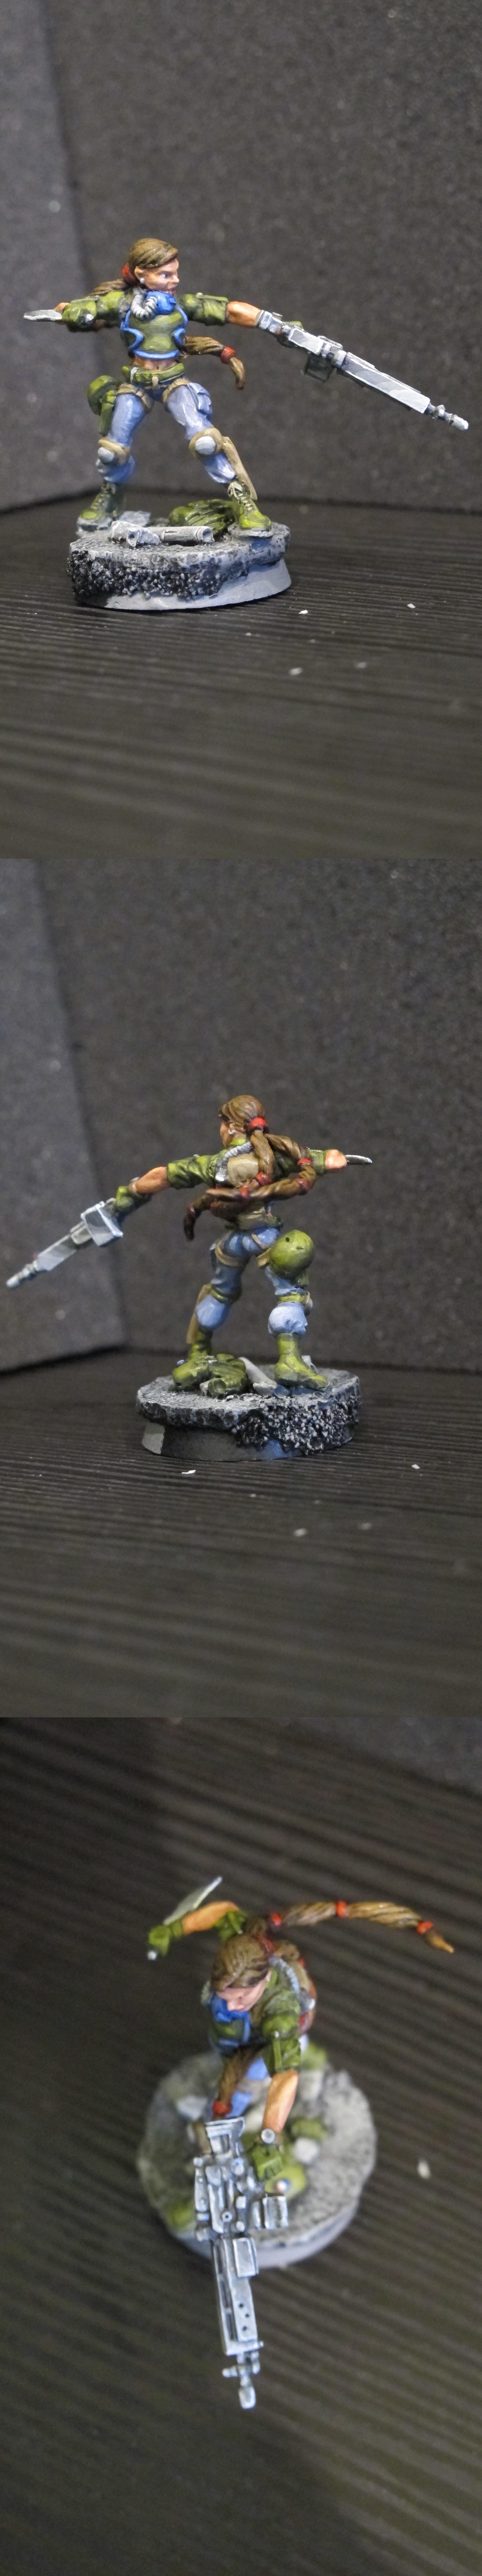 Ariadna, Hmg, Infinity, Non-Metallic Metal, Painted, Para-commando